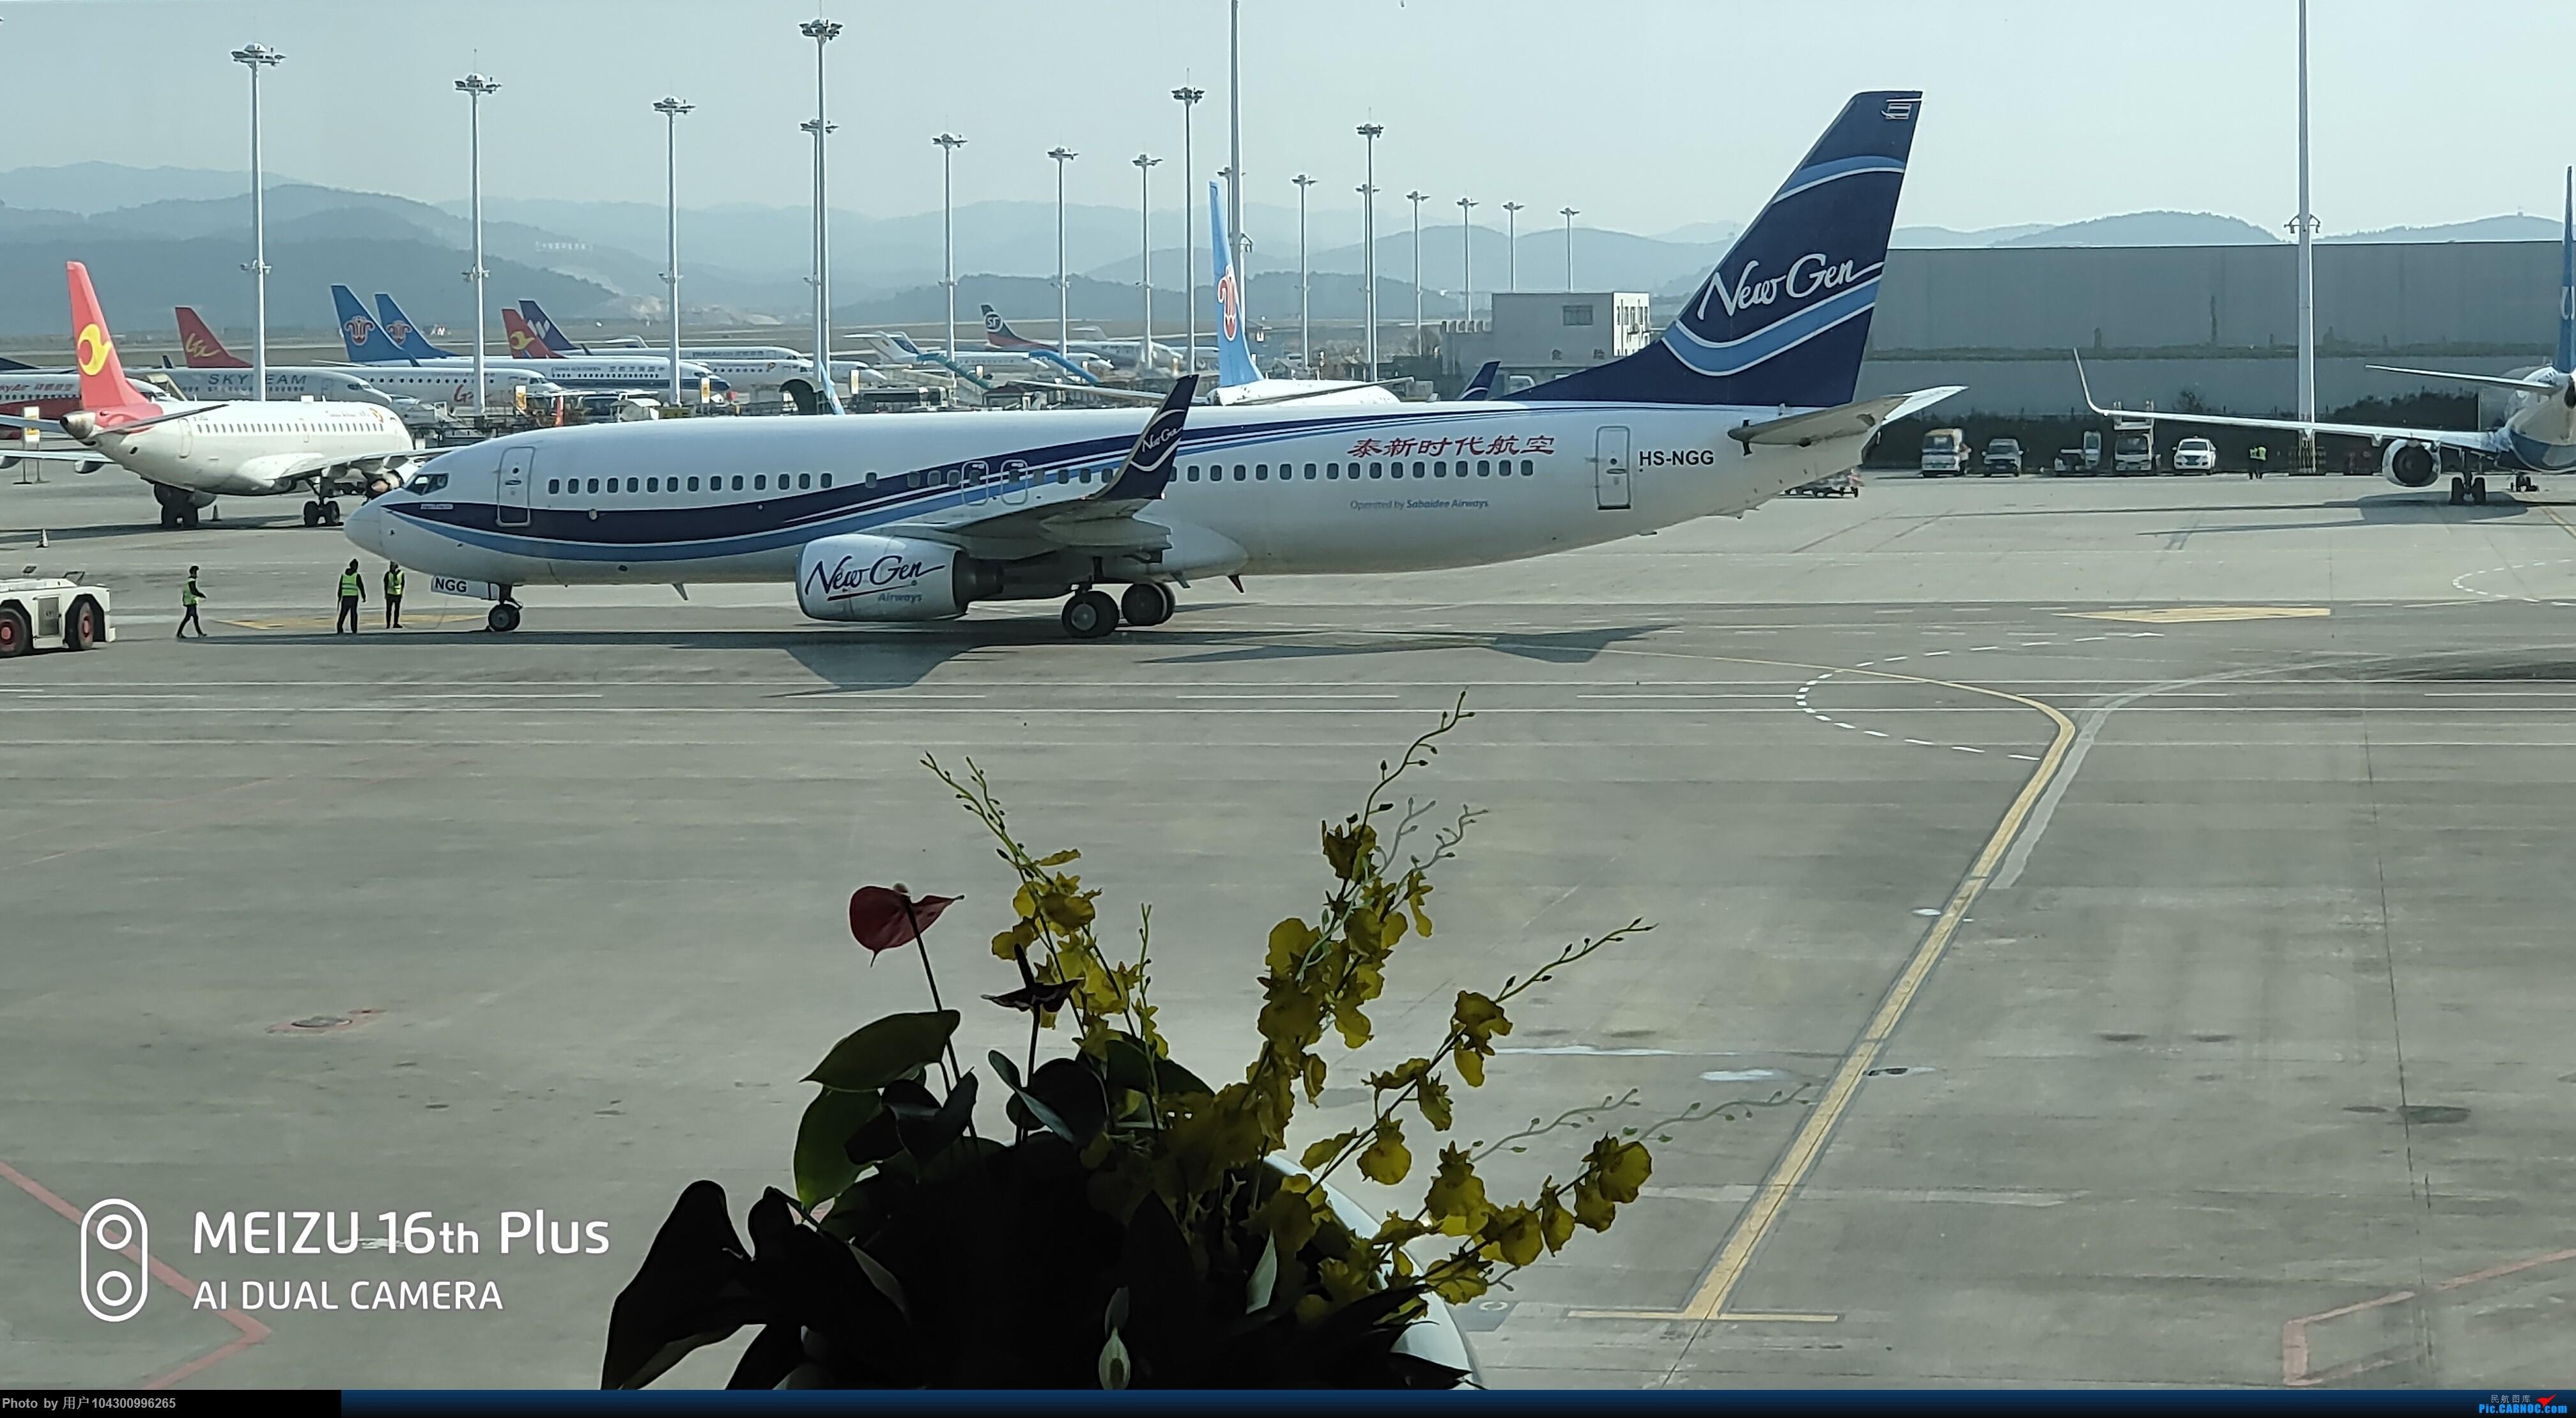 Re:[原创]囧途之贵阳--南京--杭州--贵阳 BOEING 737-800 HS-NGG 中国贵阳龙洞堡国际机场